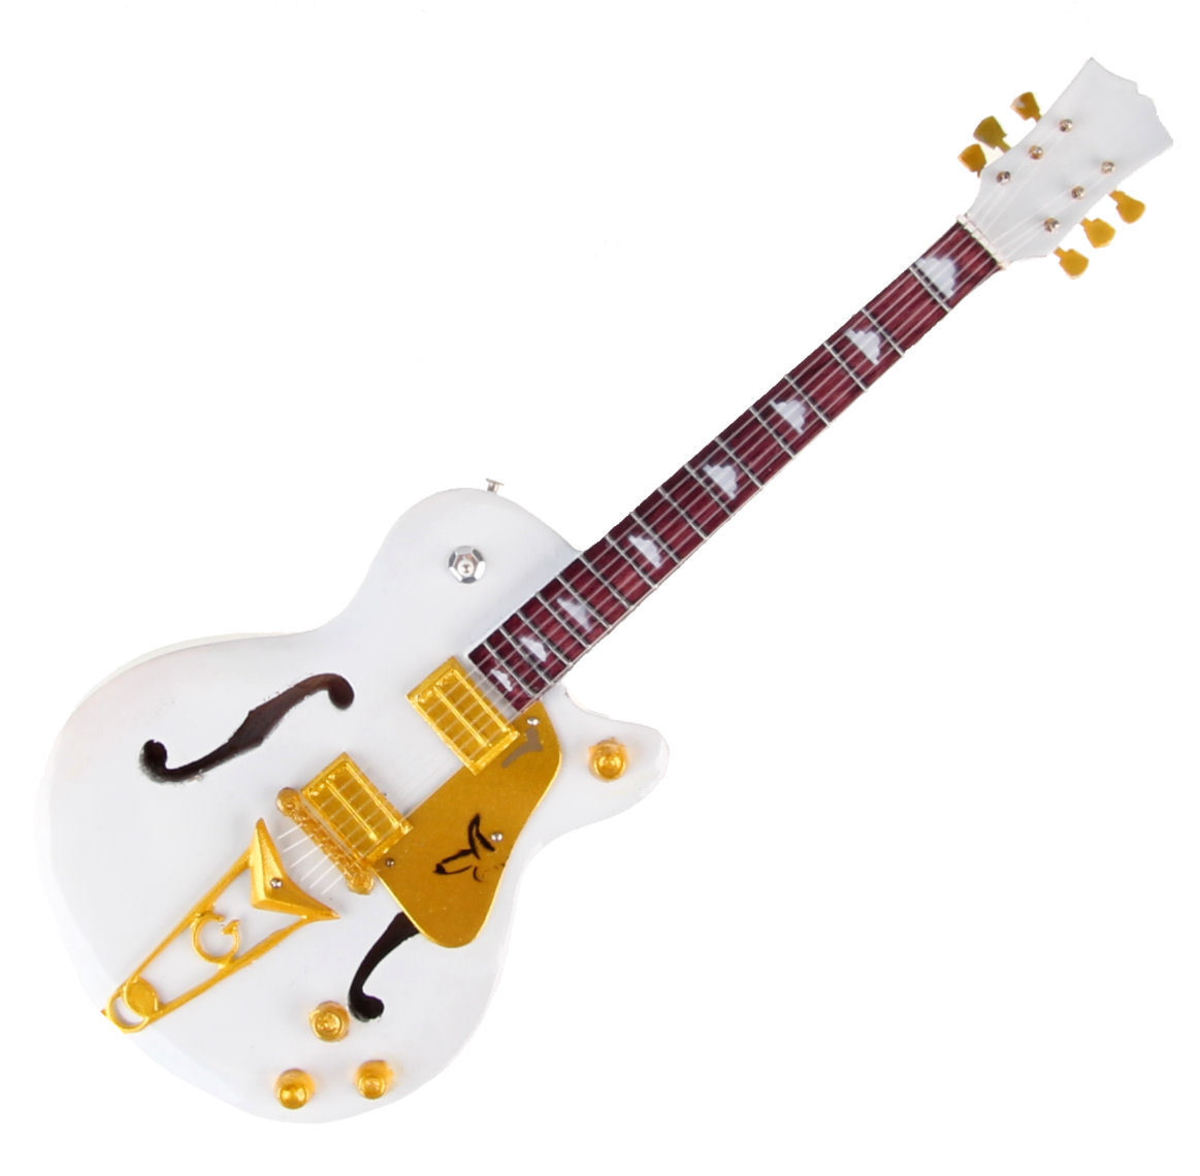 kytara Red Hot Chili Peppers